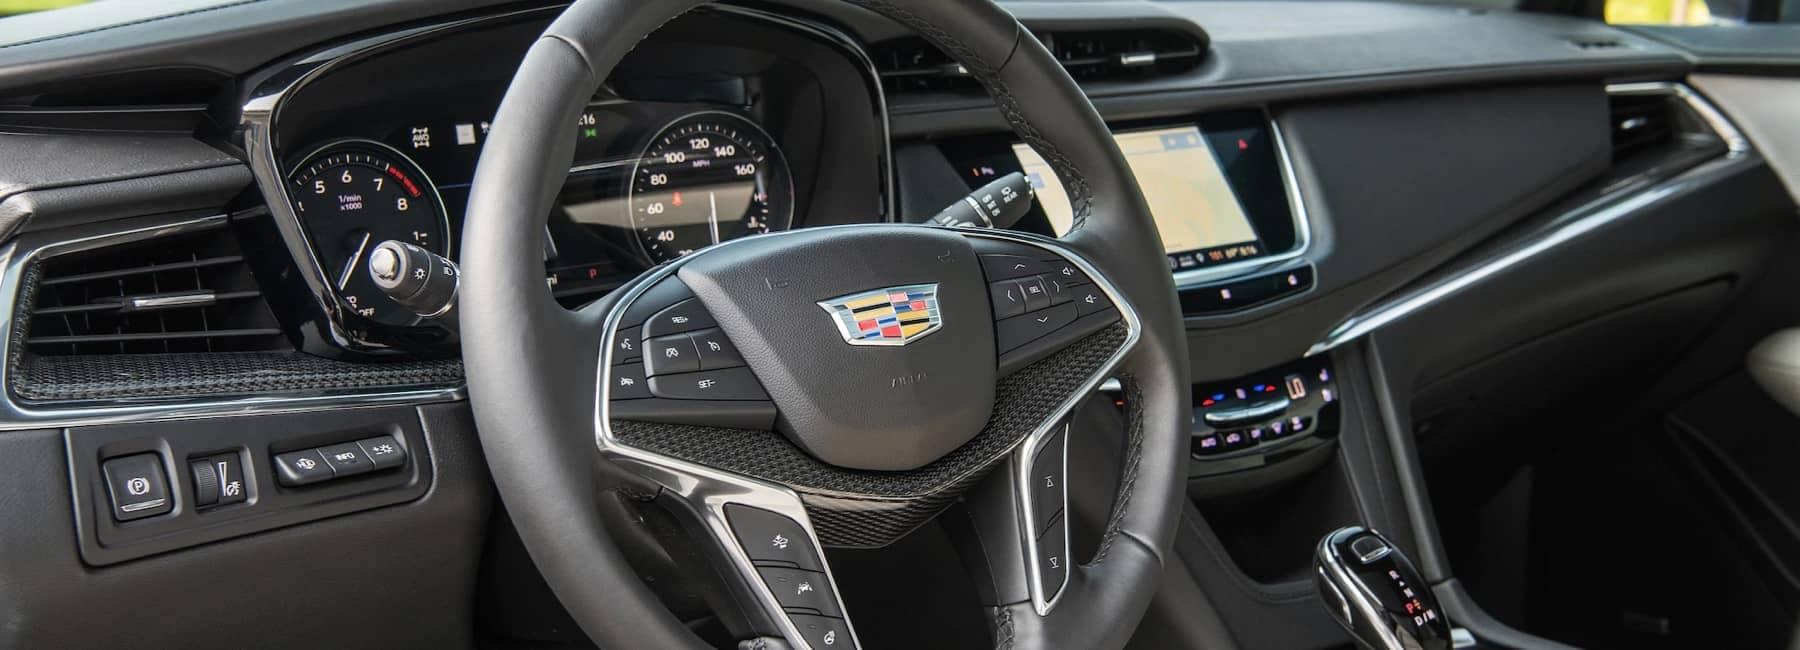 2020 XT5 Interior Steering Wheel